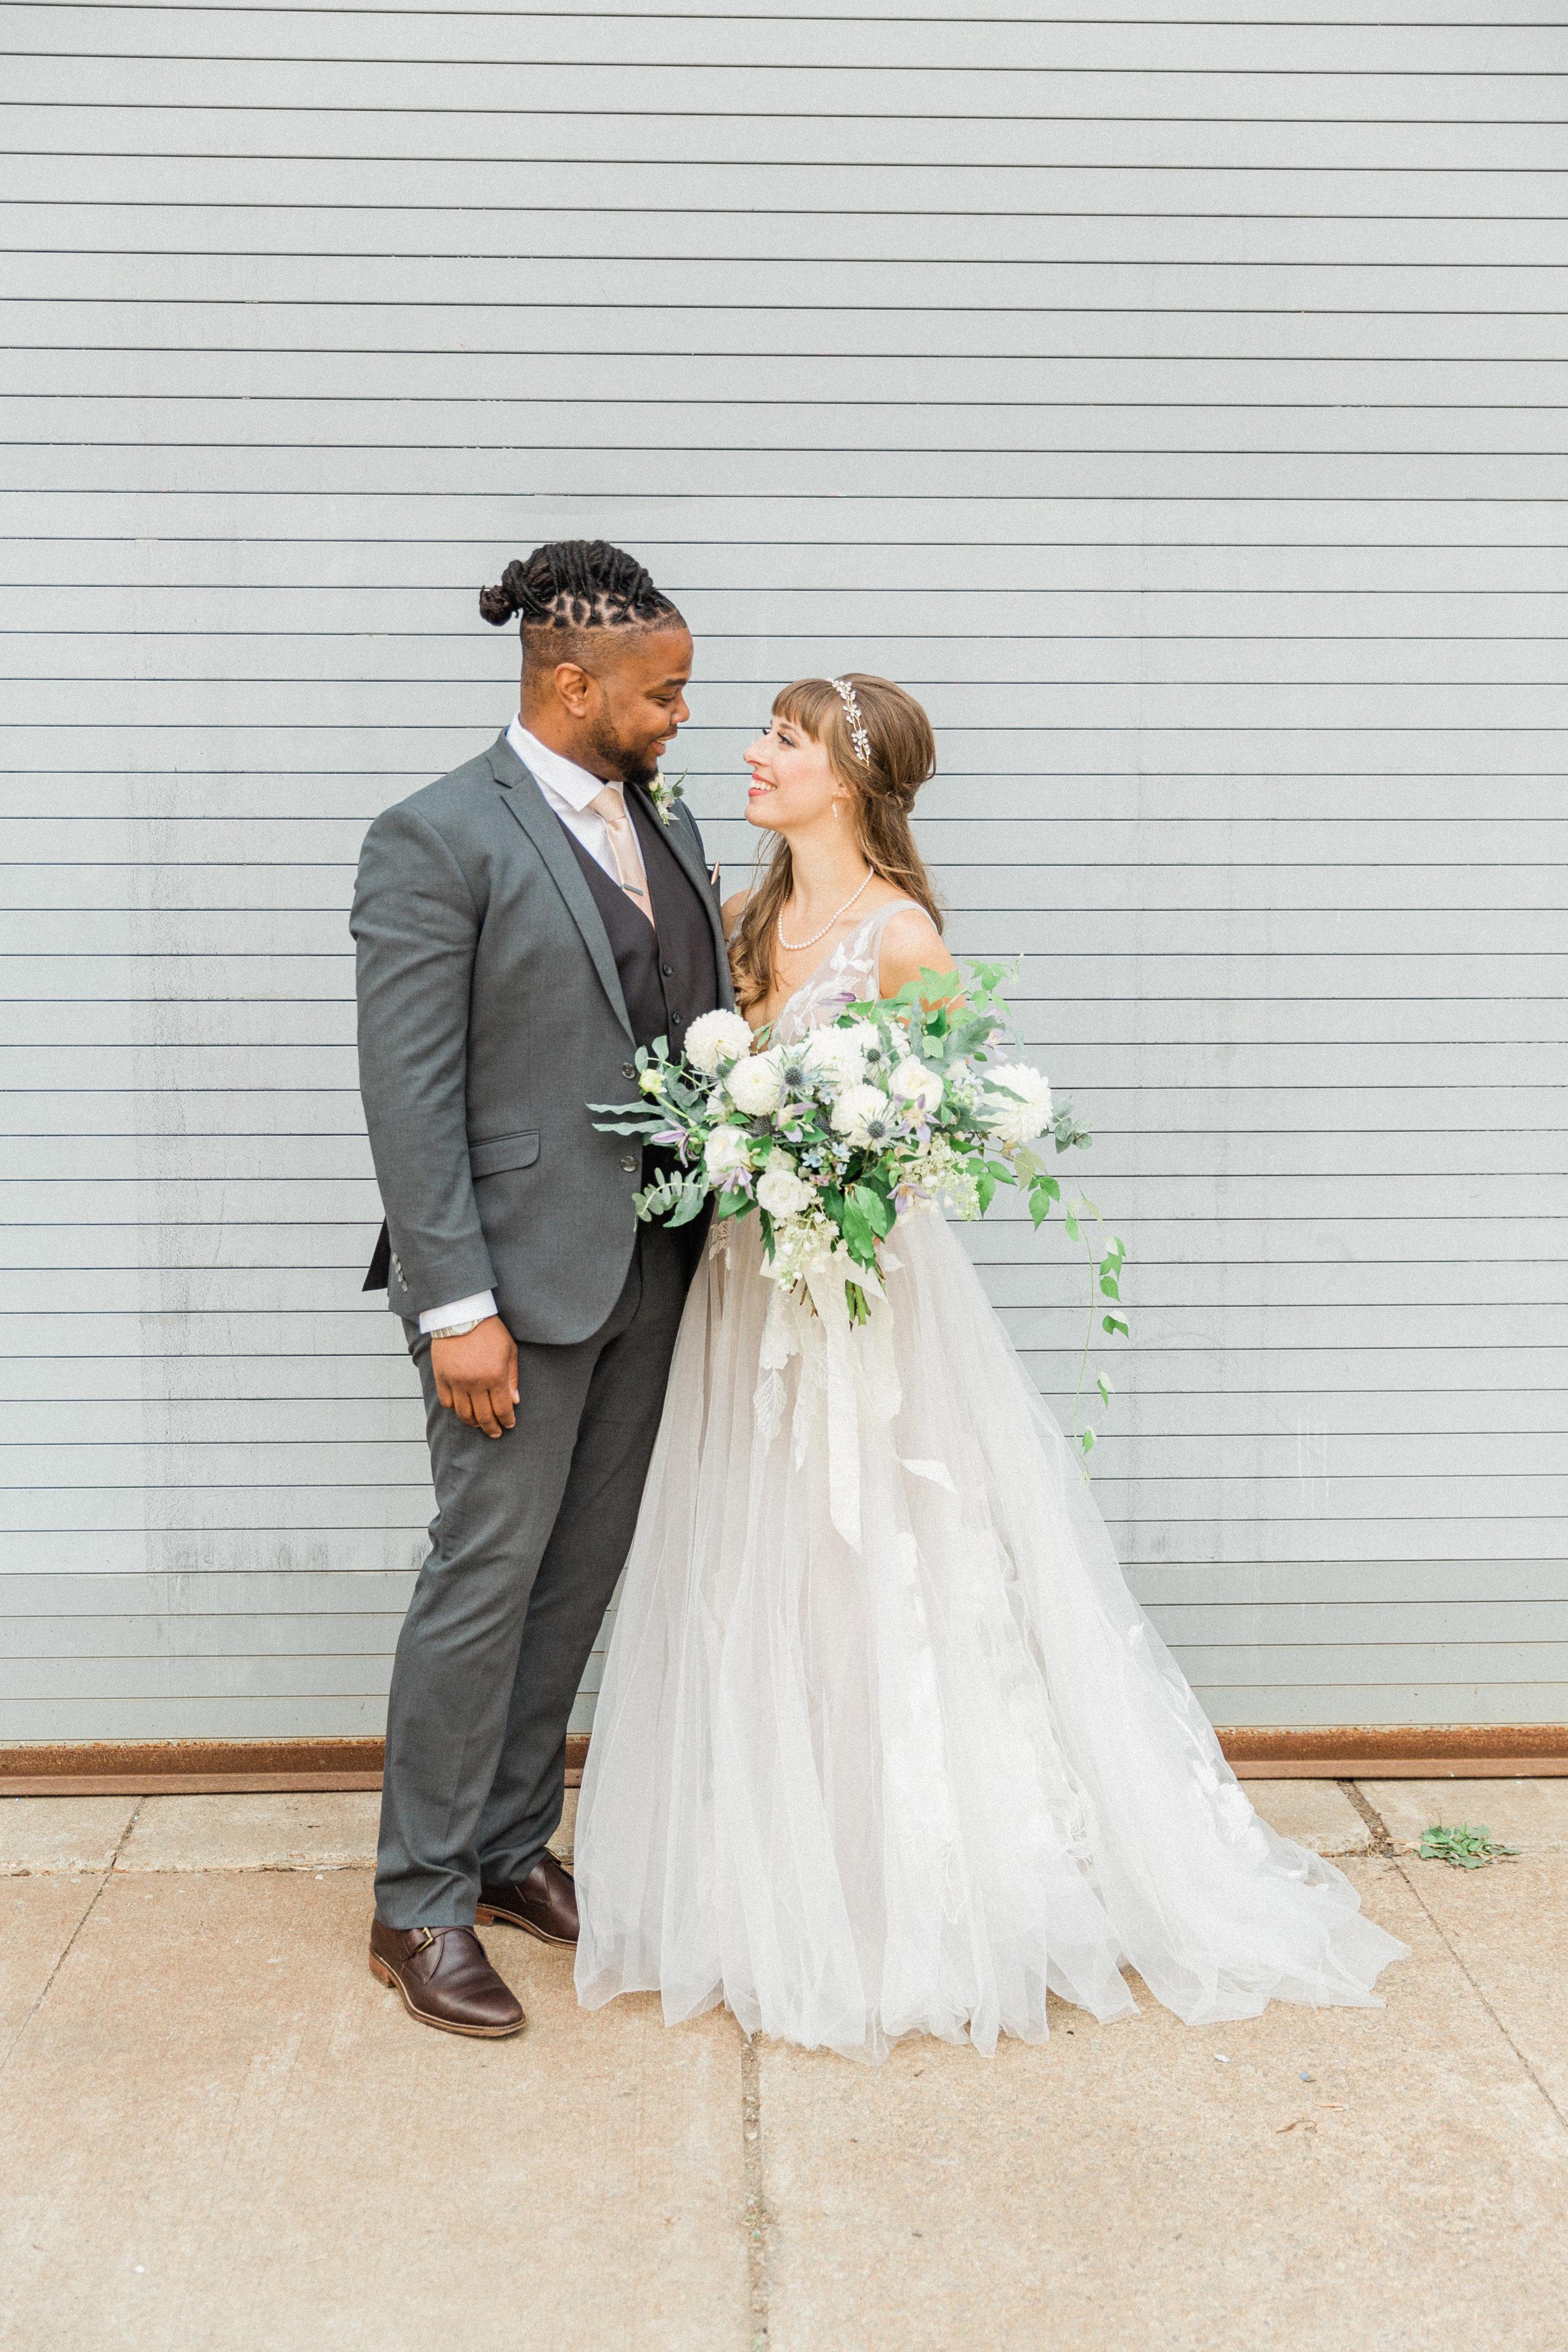 Mallory and Aaron - Married - Sneaks - Lauren Alisse Photography-52.jpg